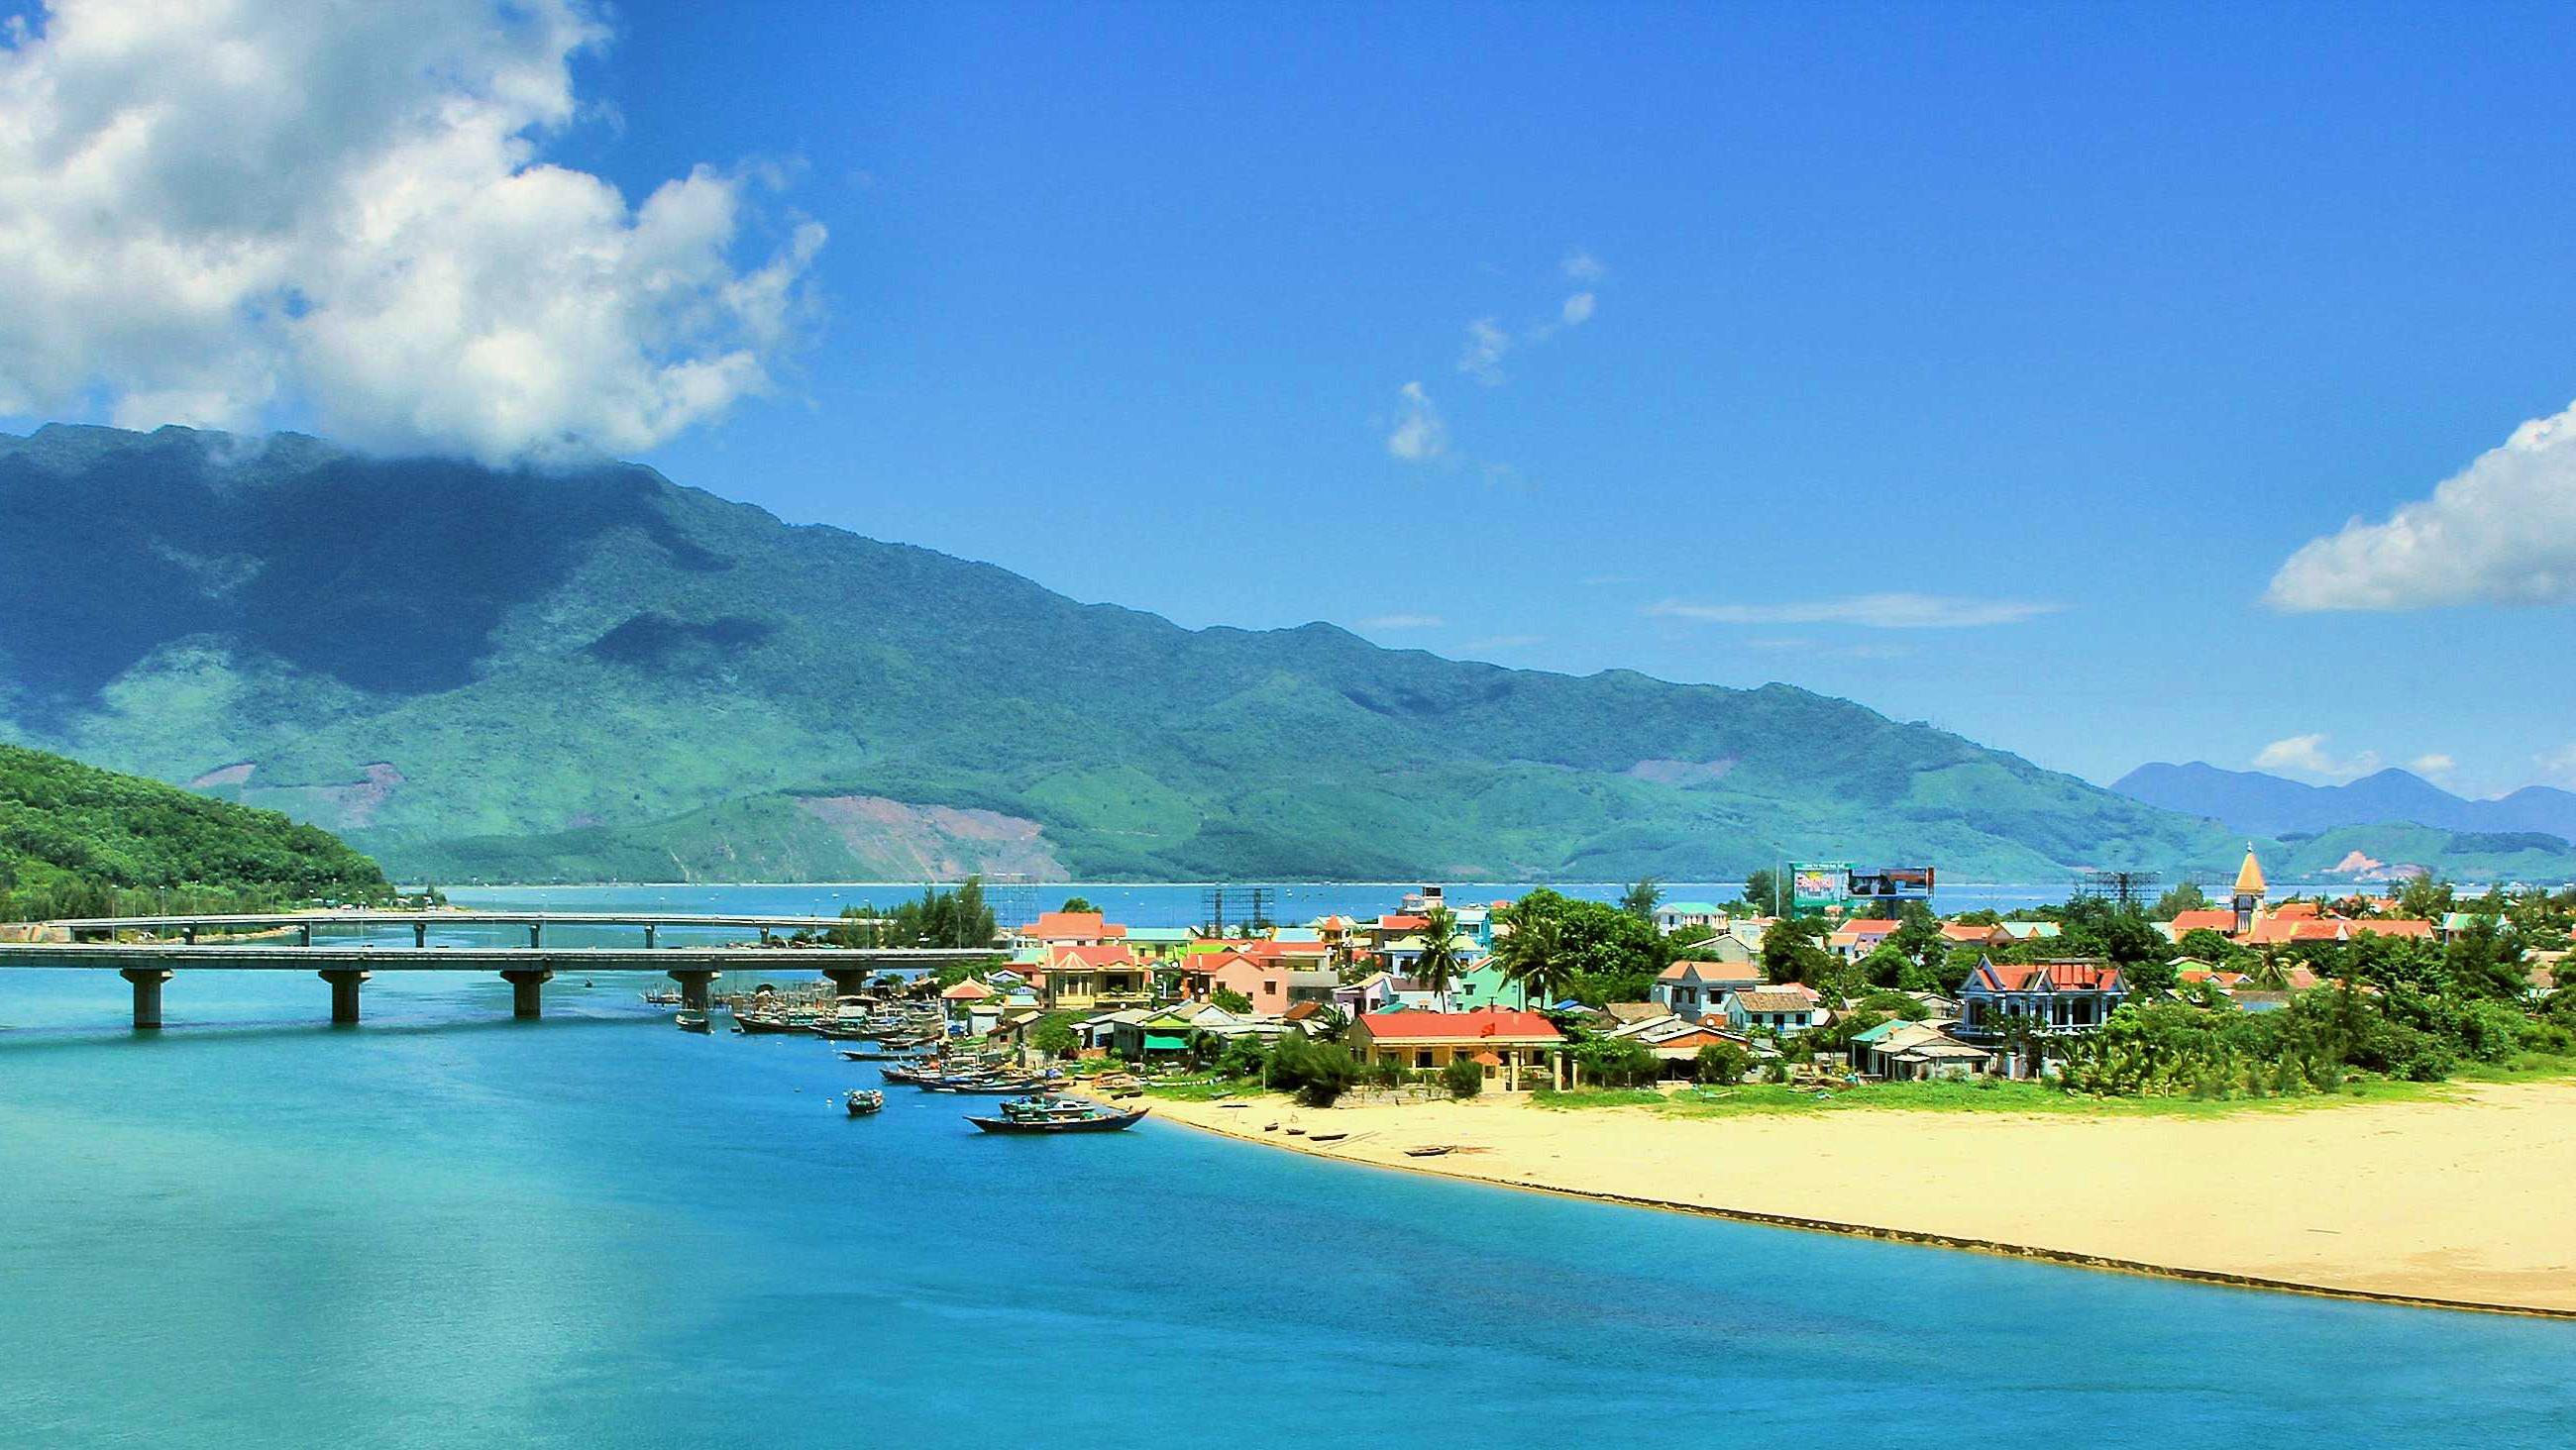 Hue city tour from Hoi An or Danang - Lang Co beach